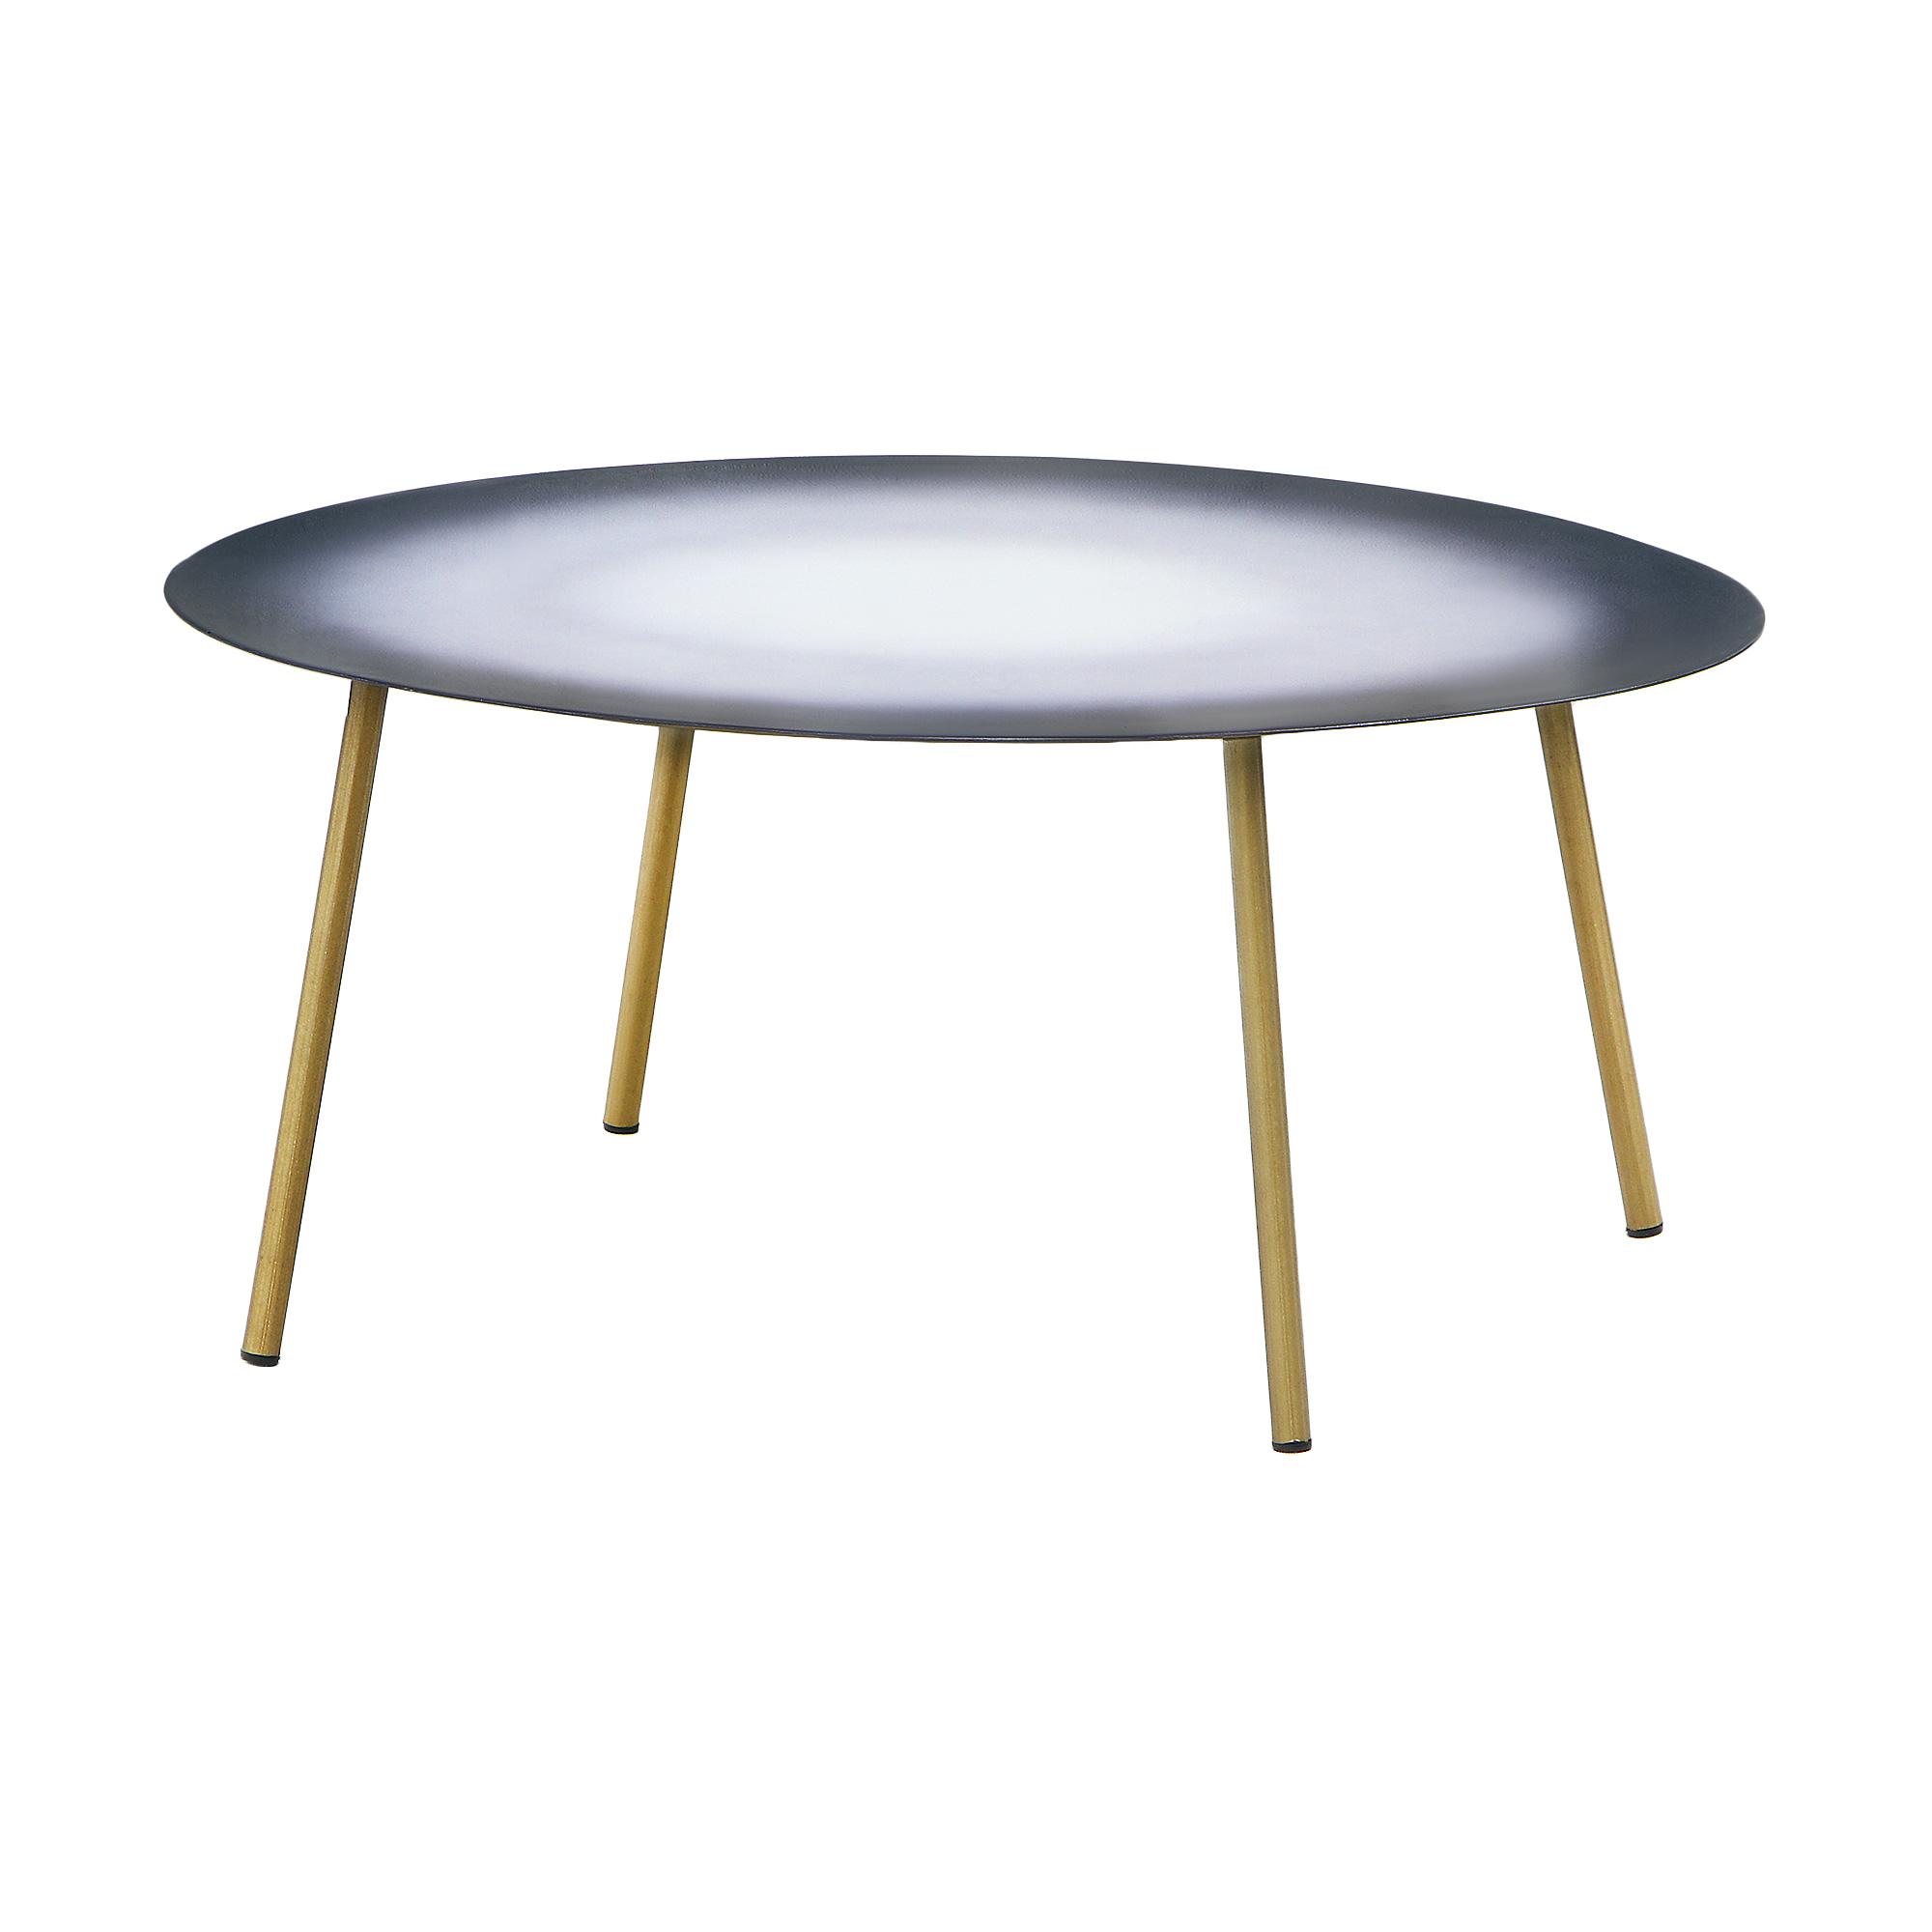 Столик кофейный Bizzotto desur 80х80х37 см liberty home кофейный столик duval gold